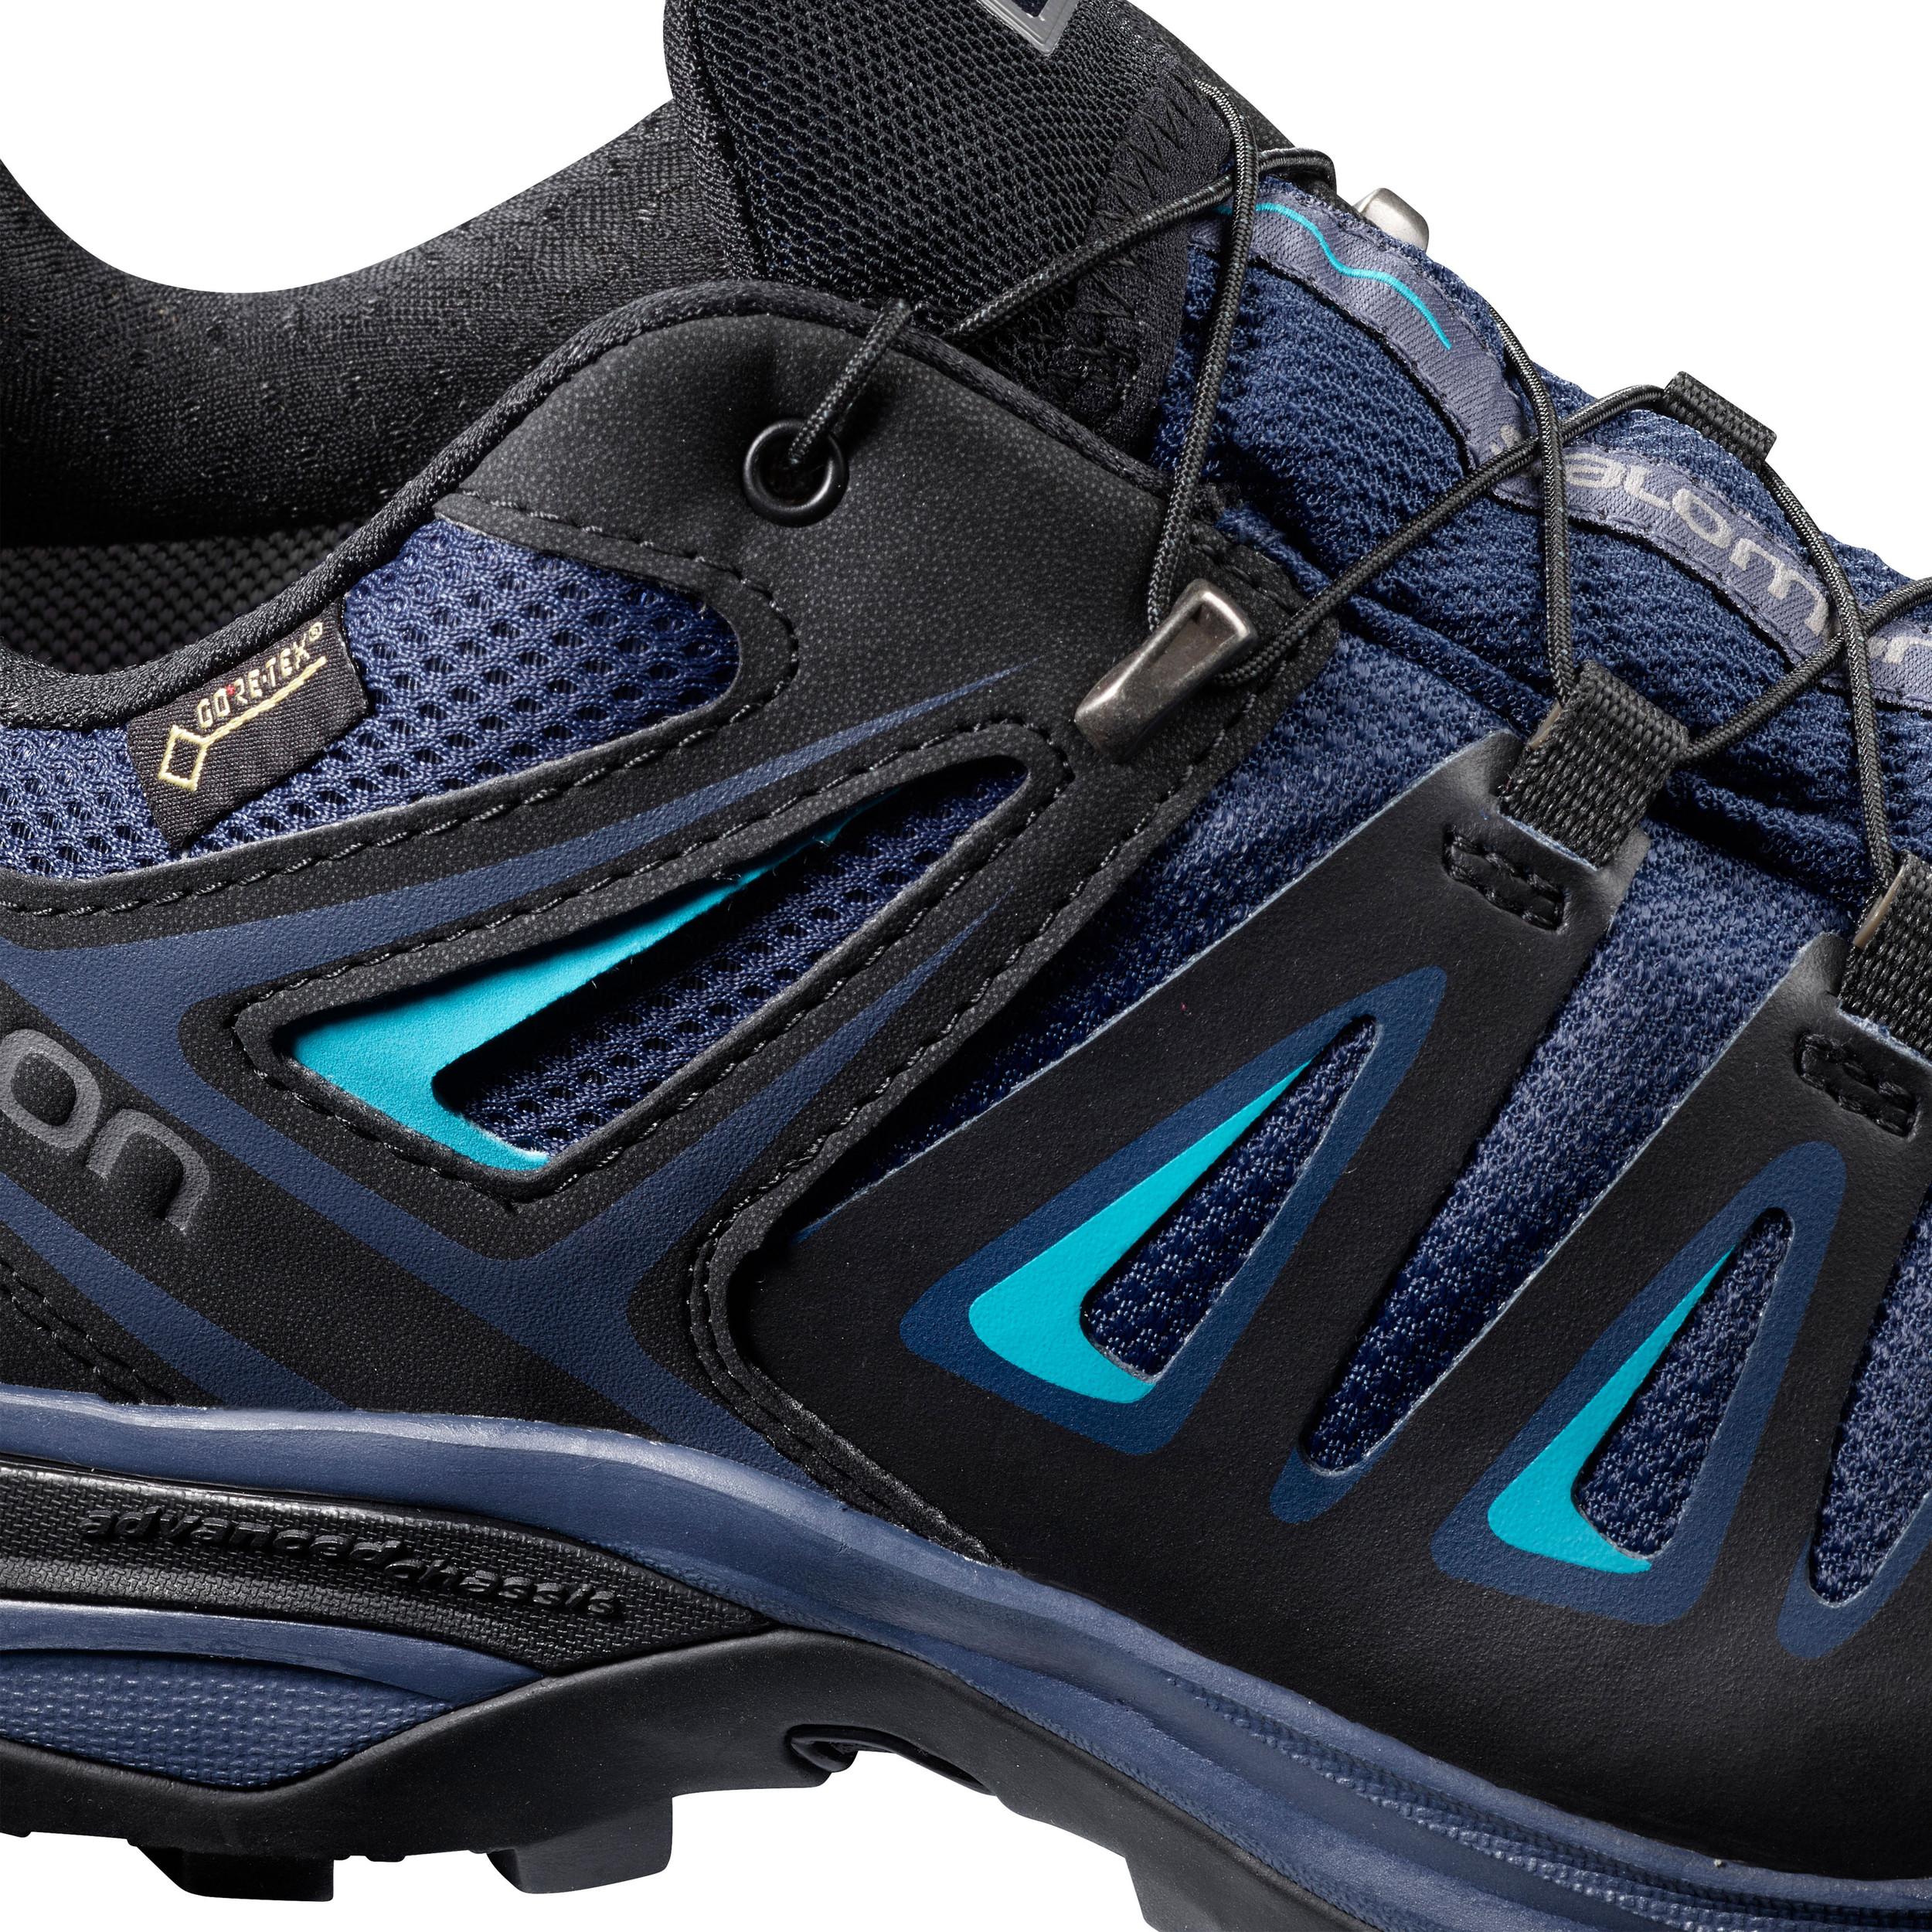 2fa0678f4b9 Salomon Femmes X Ultra 3 Gore-Tex Chaussure De Marche Randonnée Bleu Marine